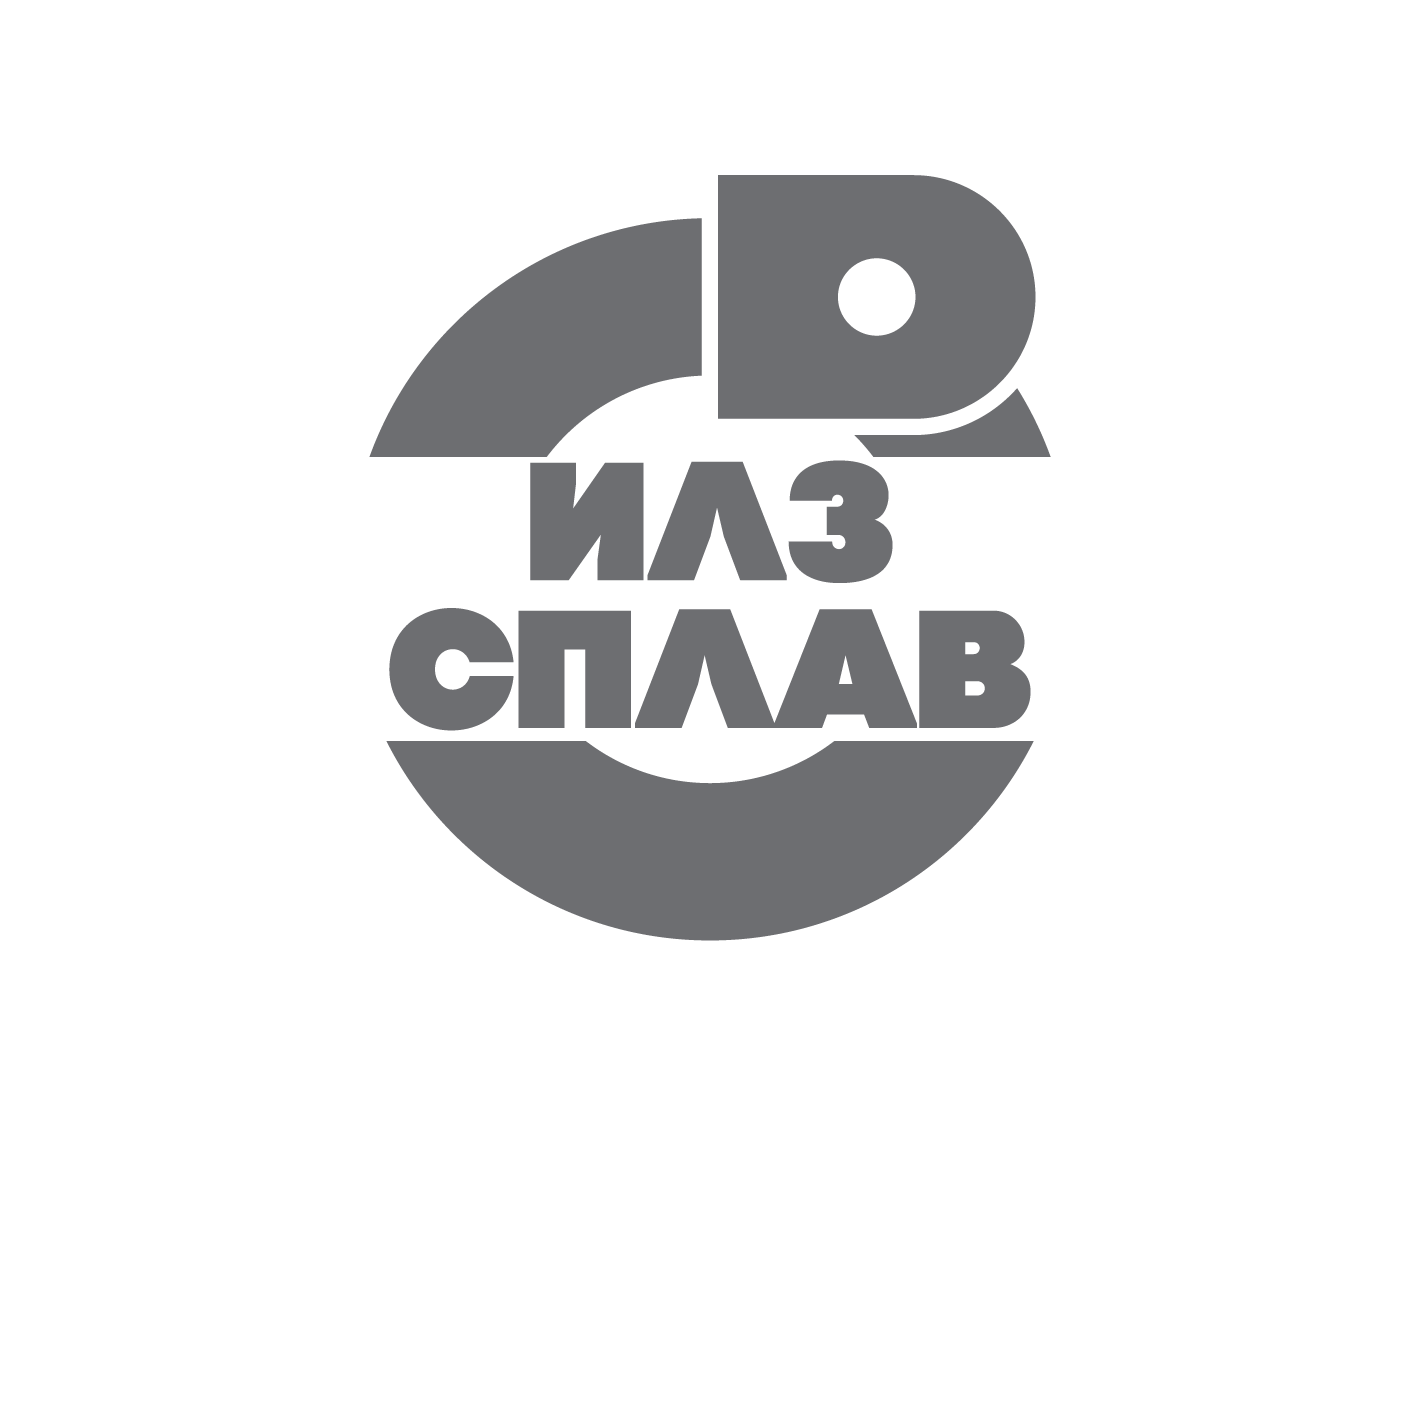 Разработать логотип для литейного завода фото f_2995af9fc01b0bf7.png